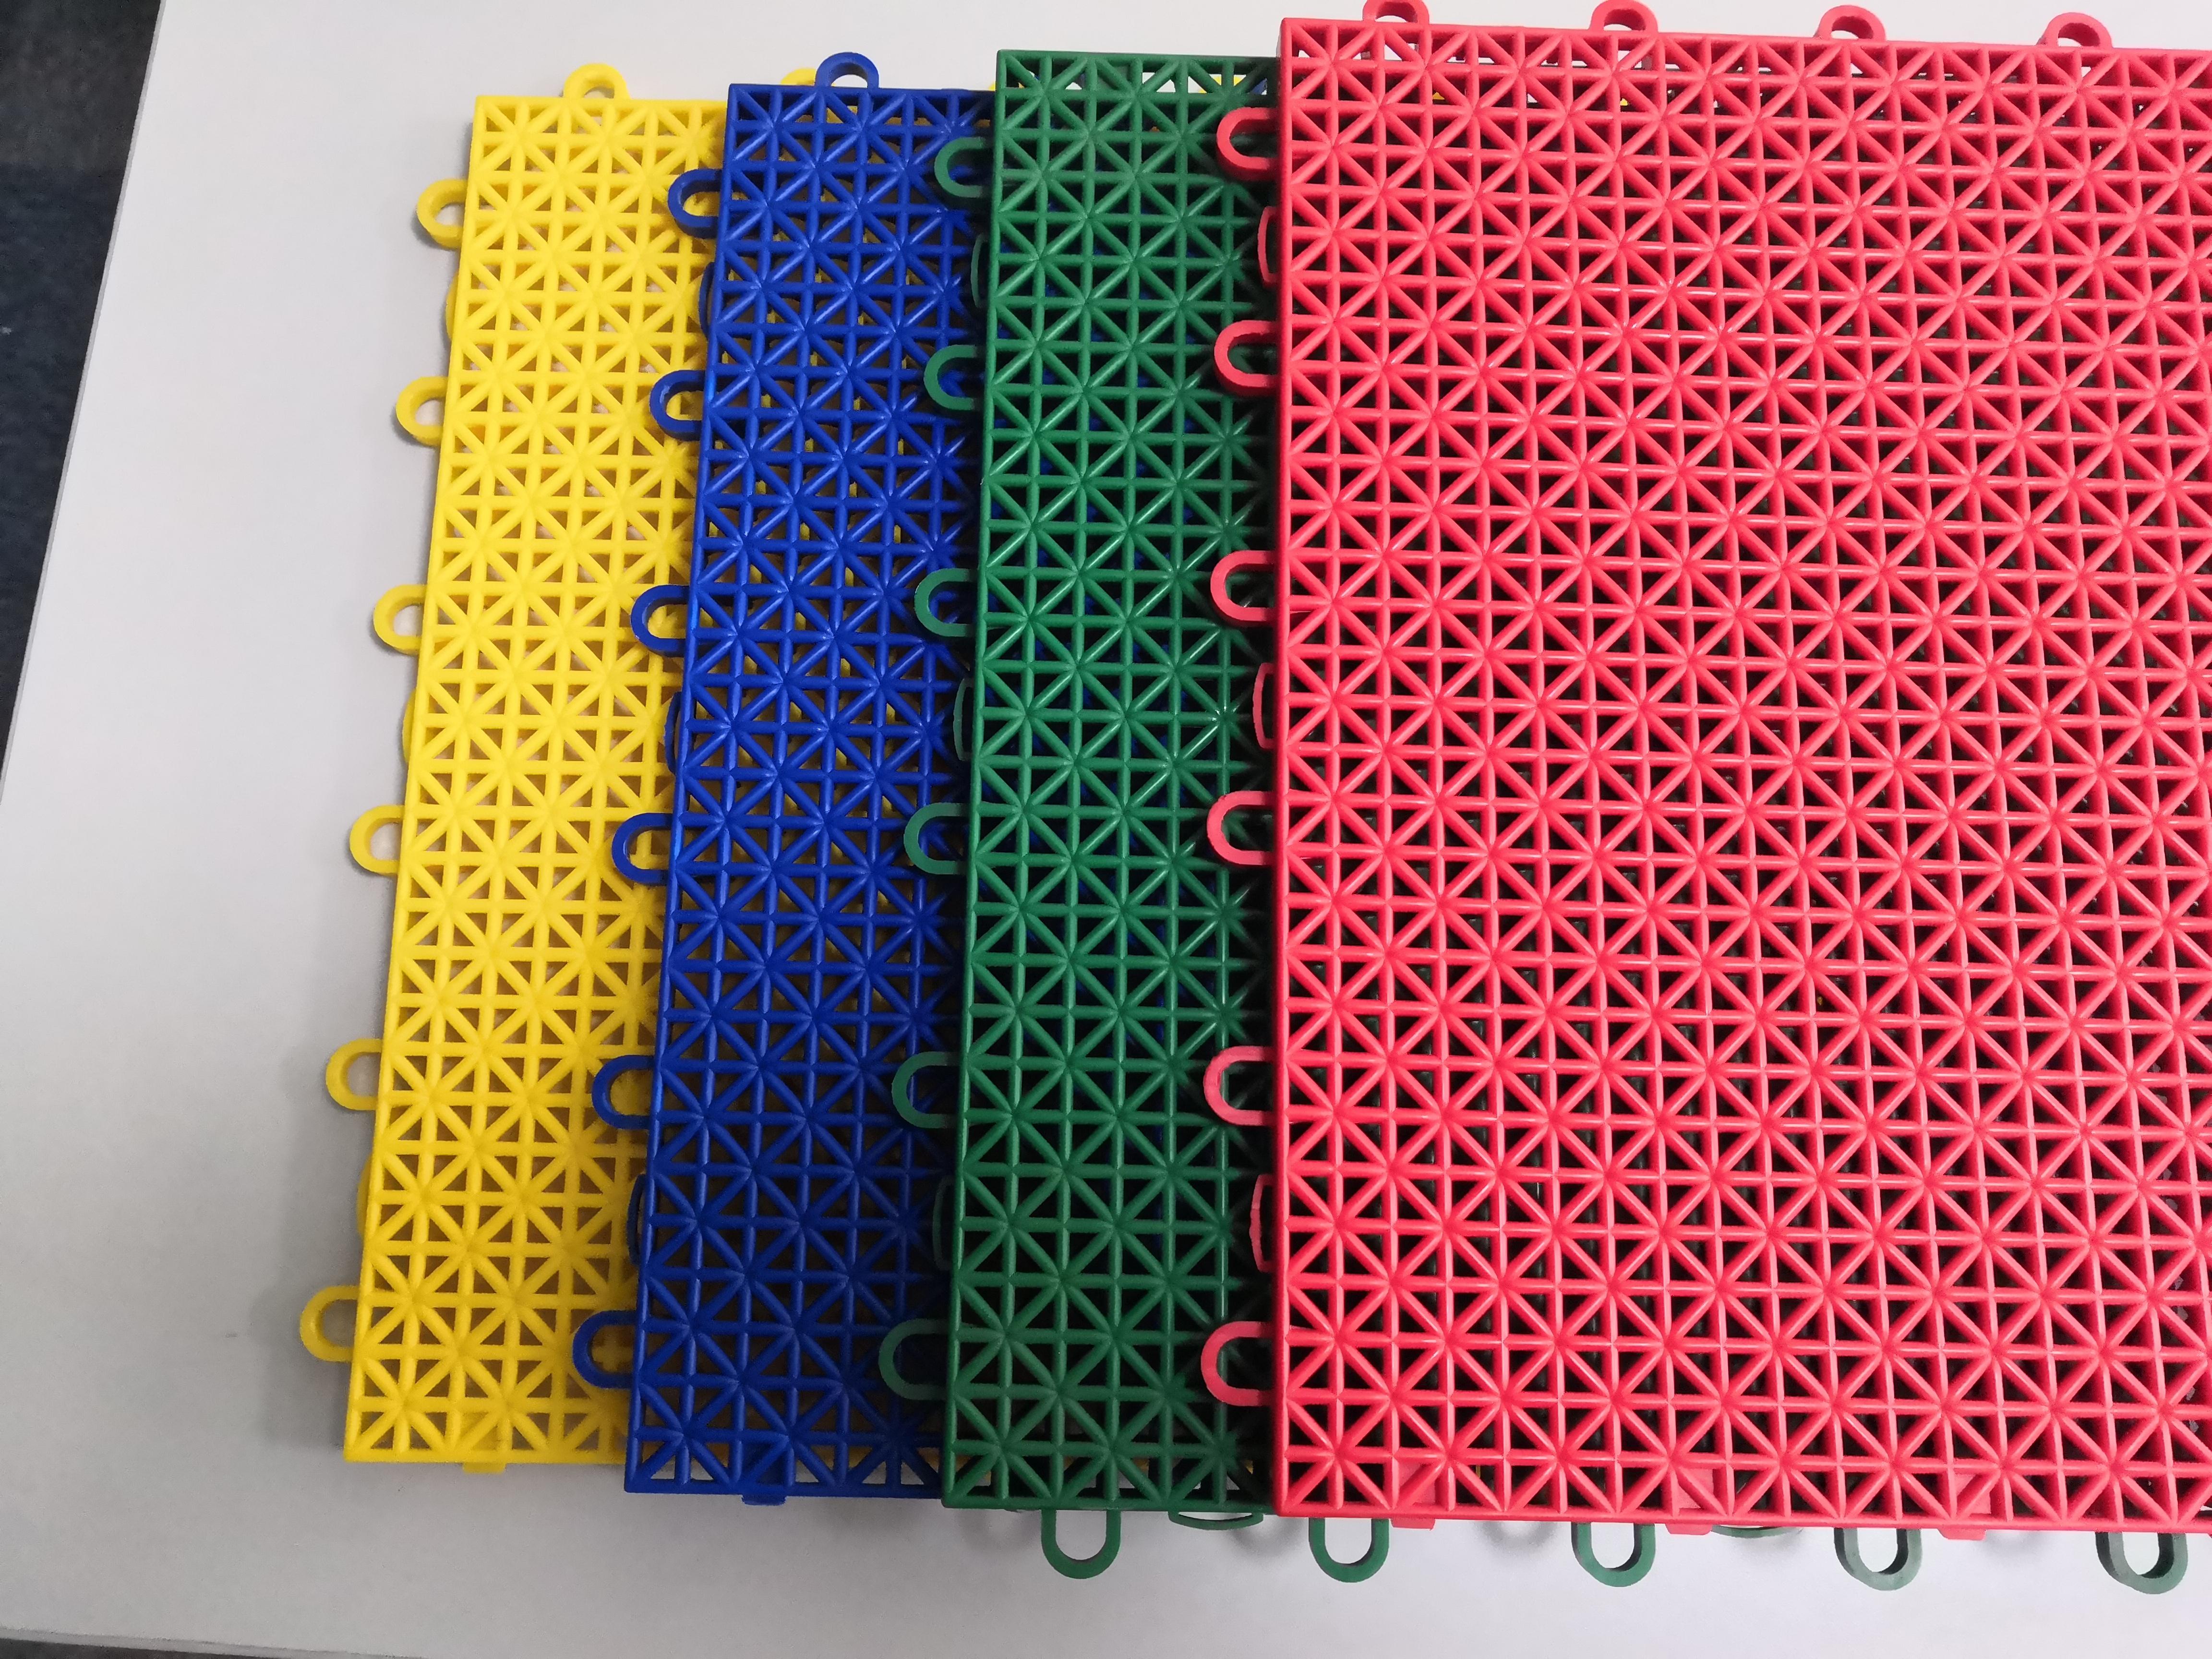 Easy install outdoor PP interlocking tiles basketball court flooring